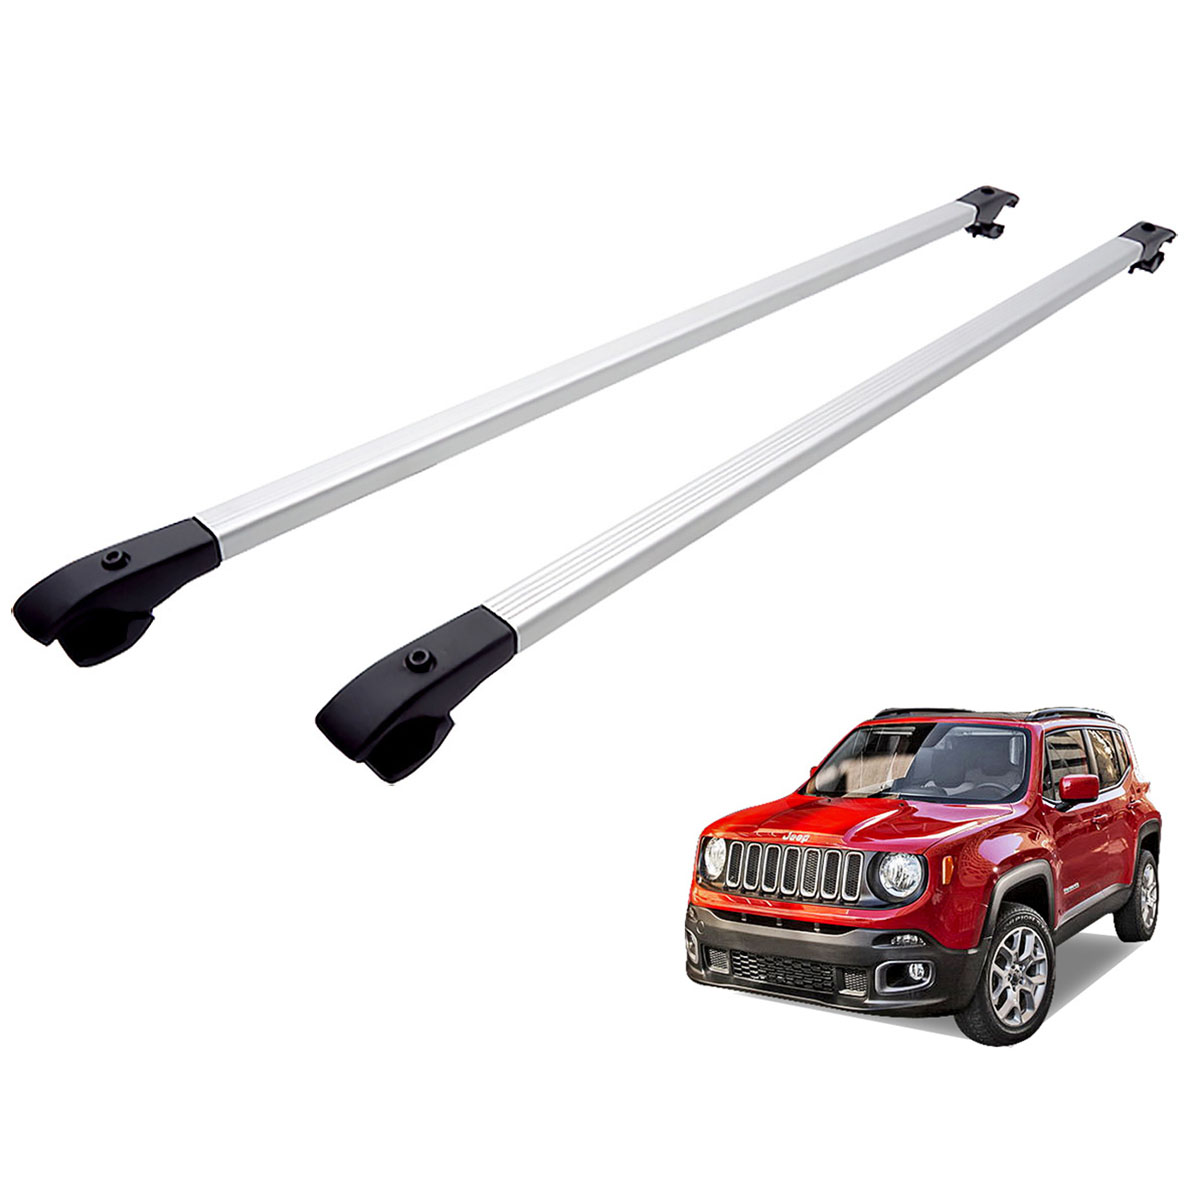 Travessa rack de teto alumínio Jeep Renegade 2016 2017